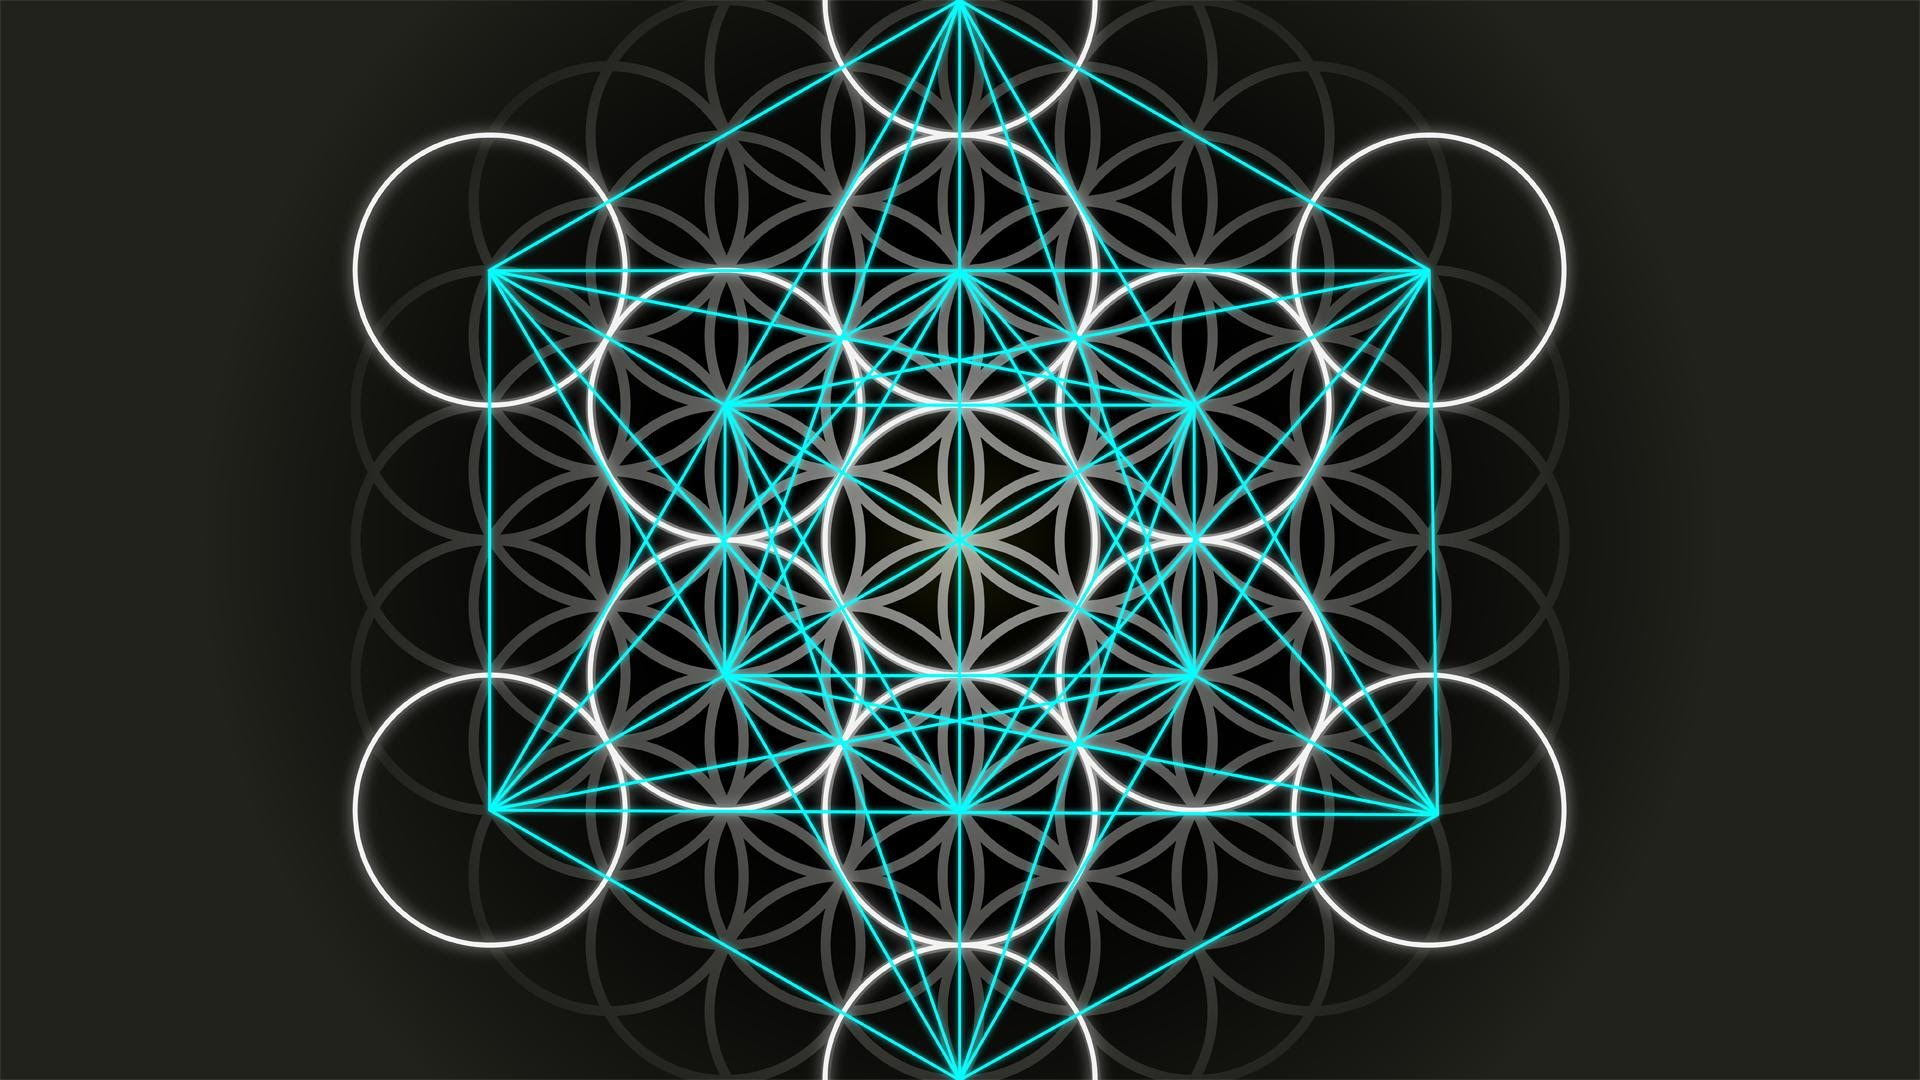 Sacred Geometry Wallpaper Hd 65 Images